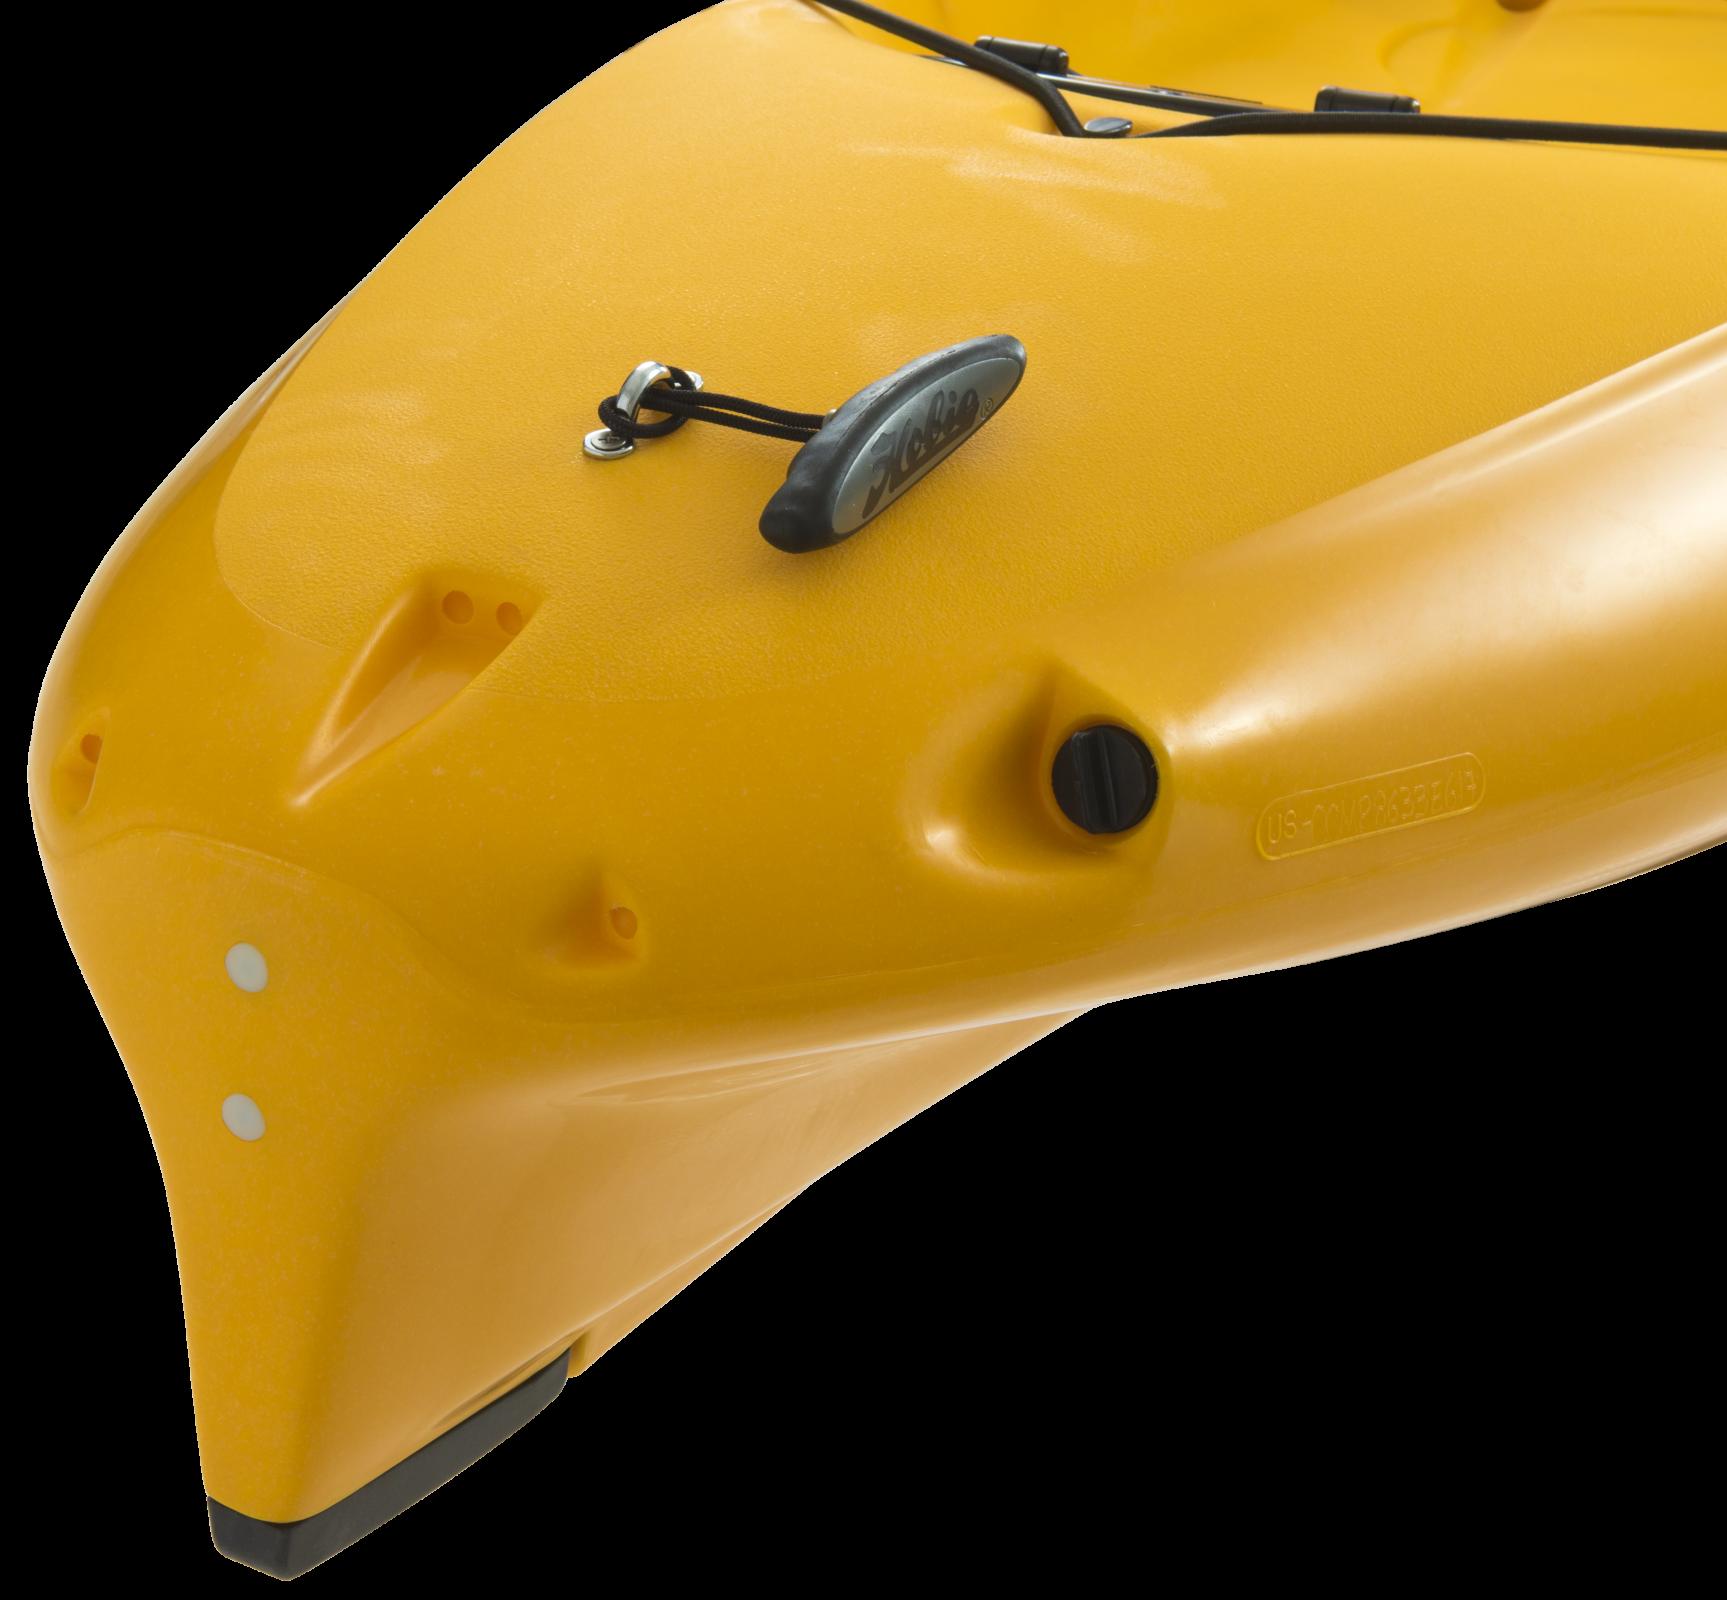 Hobie Quest 13 Paddle Kayak - 792176394419